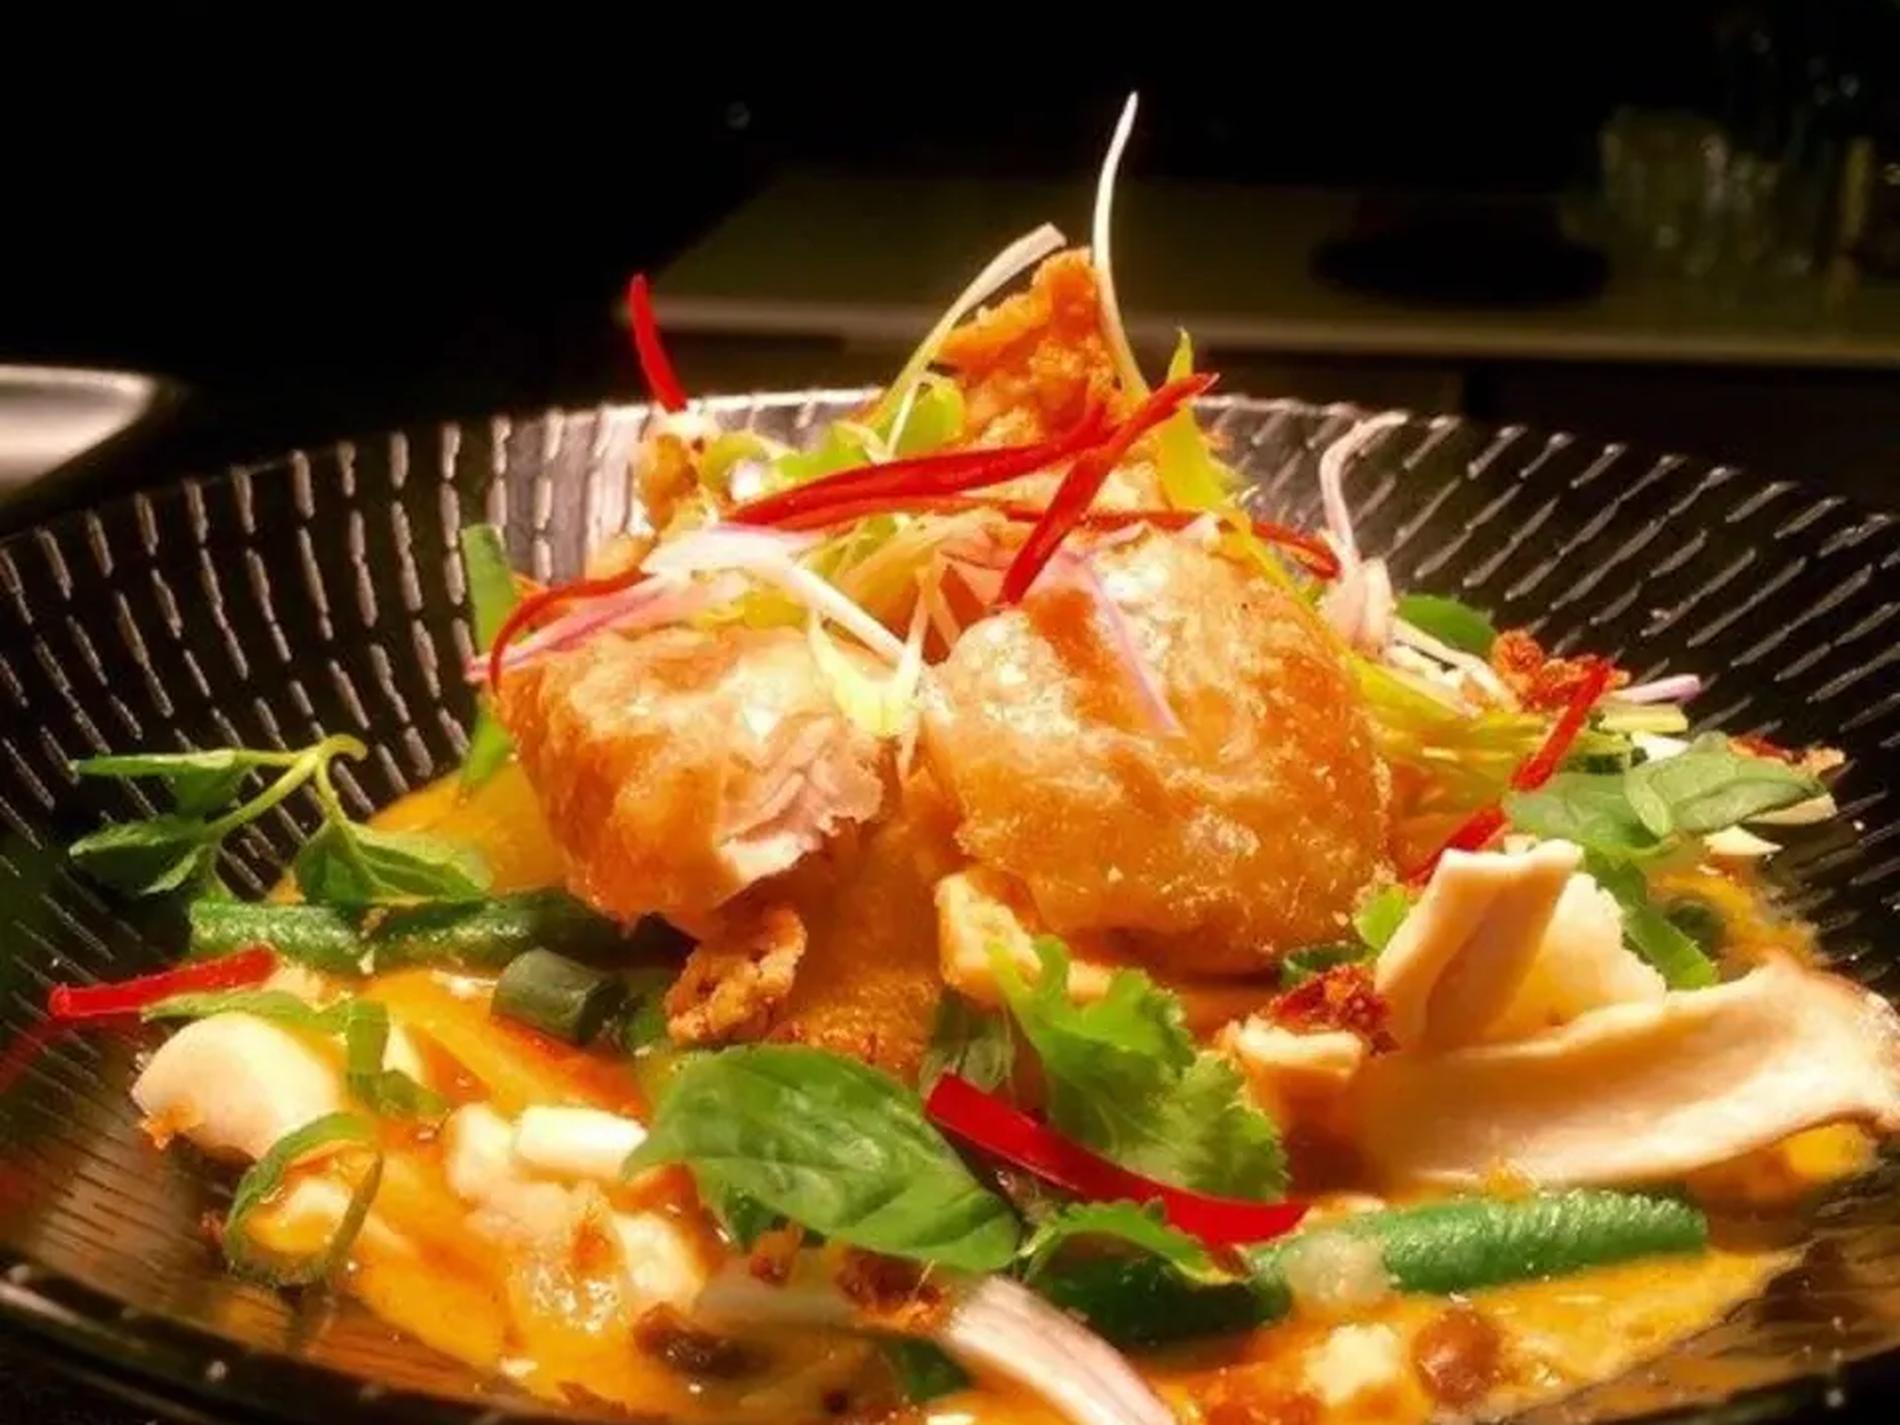 On Trend Vietnamese Restaurant Business For Sale